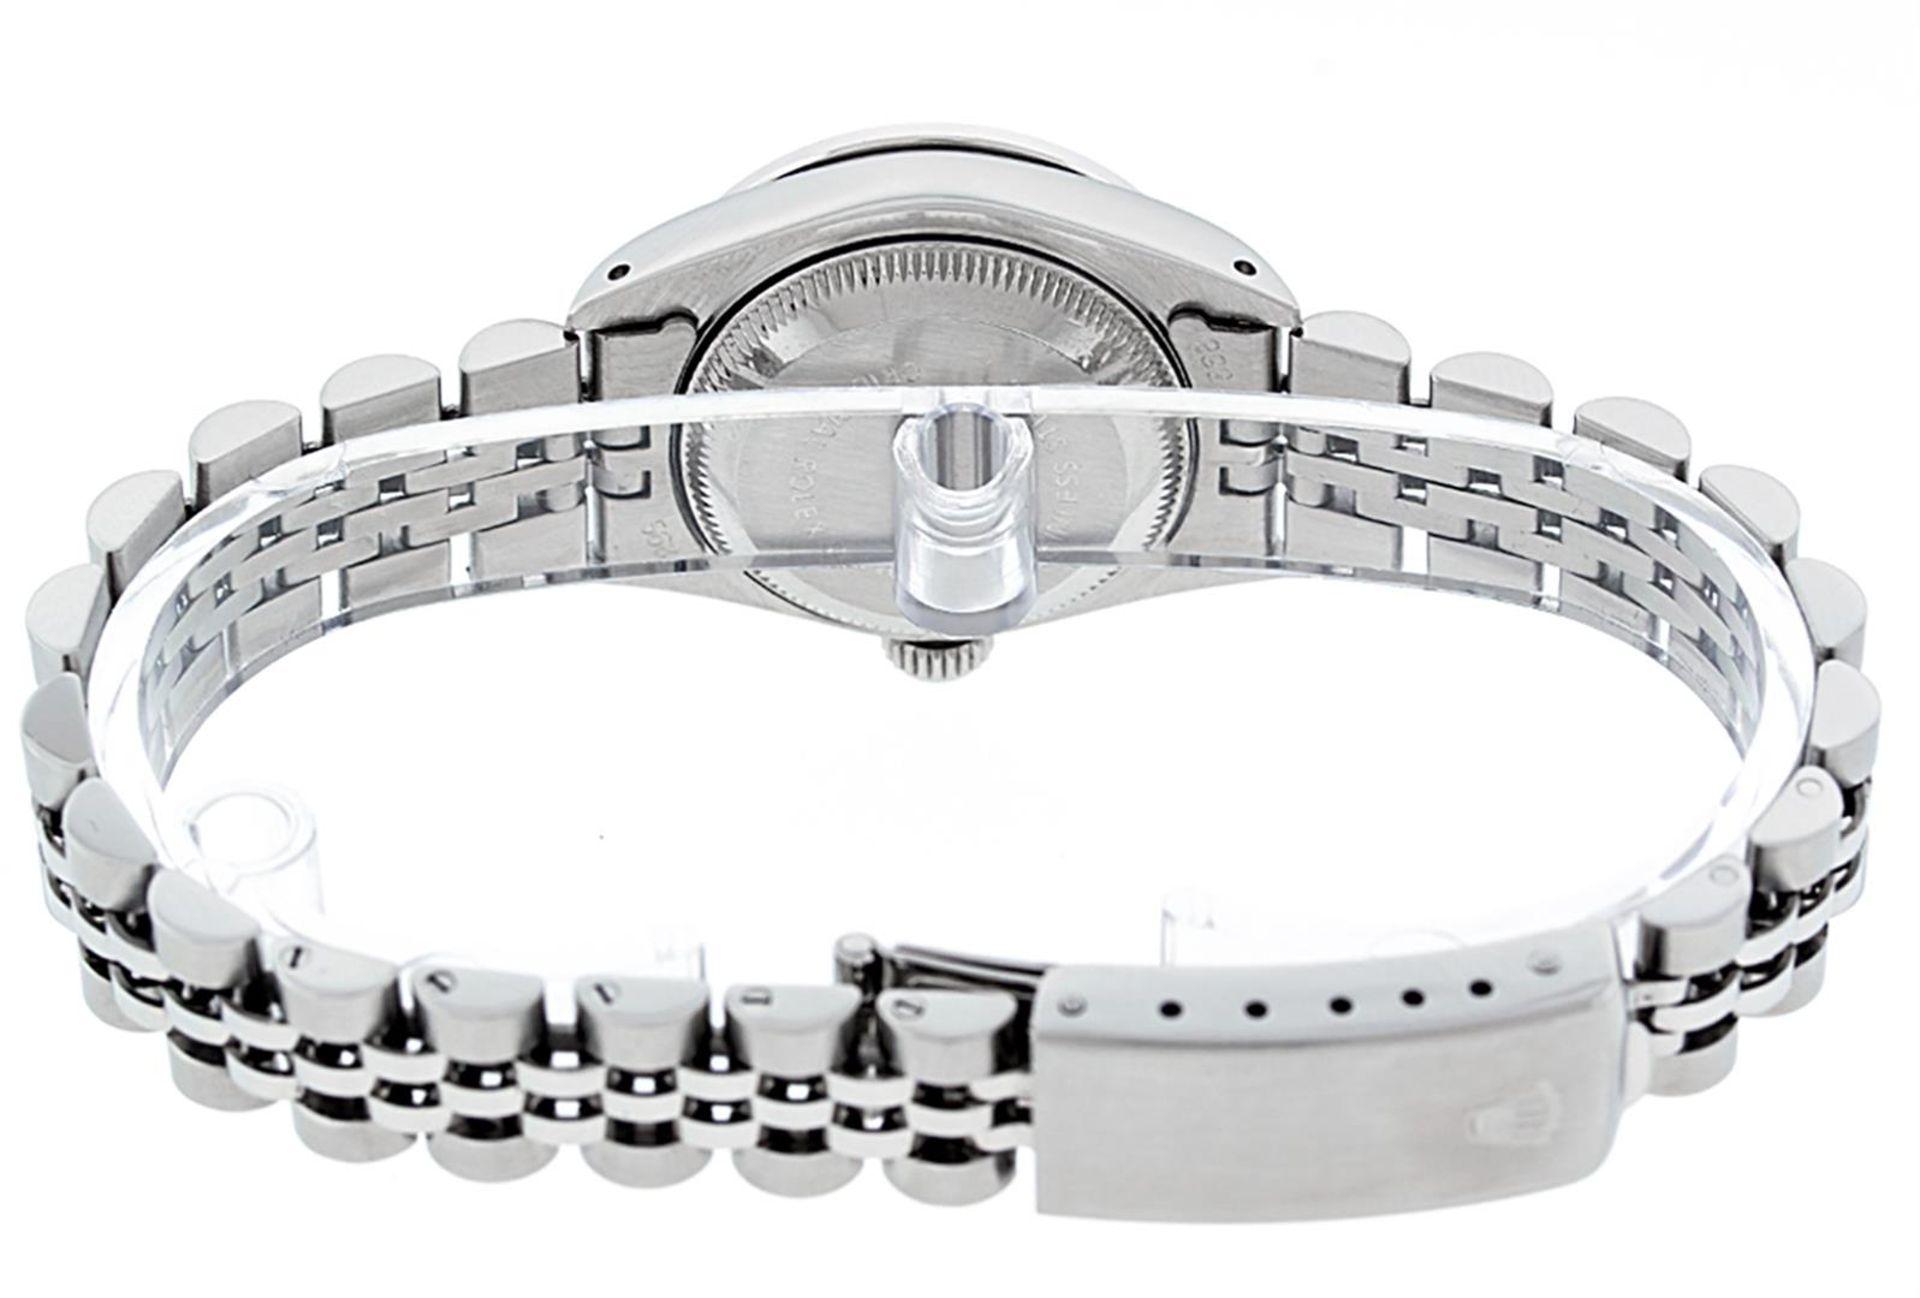 Rolex Ladies Stainless Steel 26MM Purple String Diamond Lugs Datejust Wristwatch - Image 5 of 9